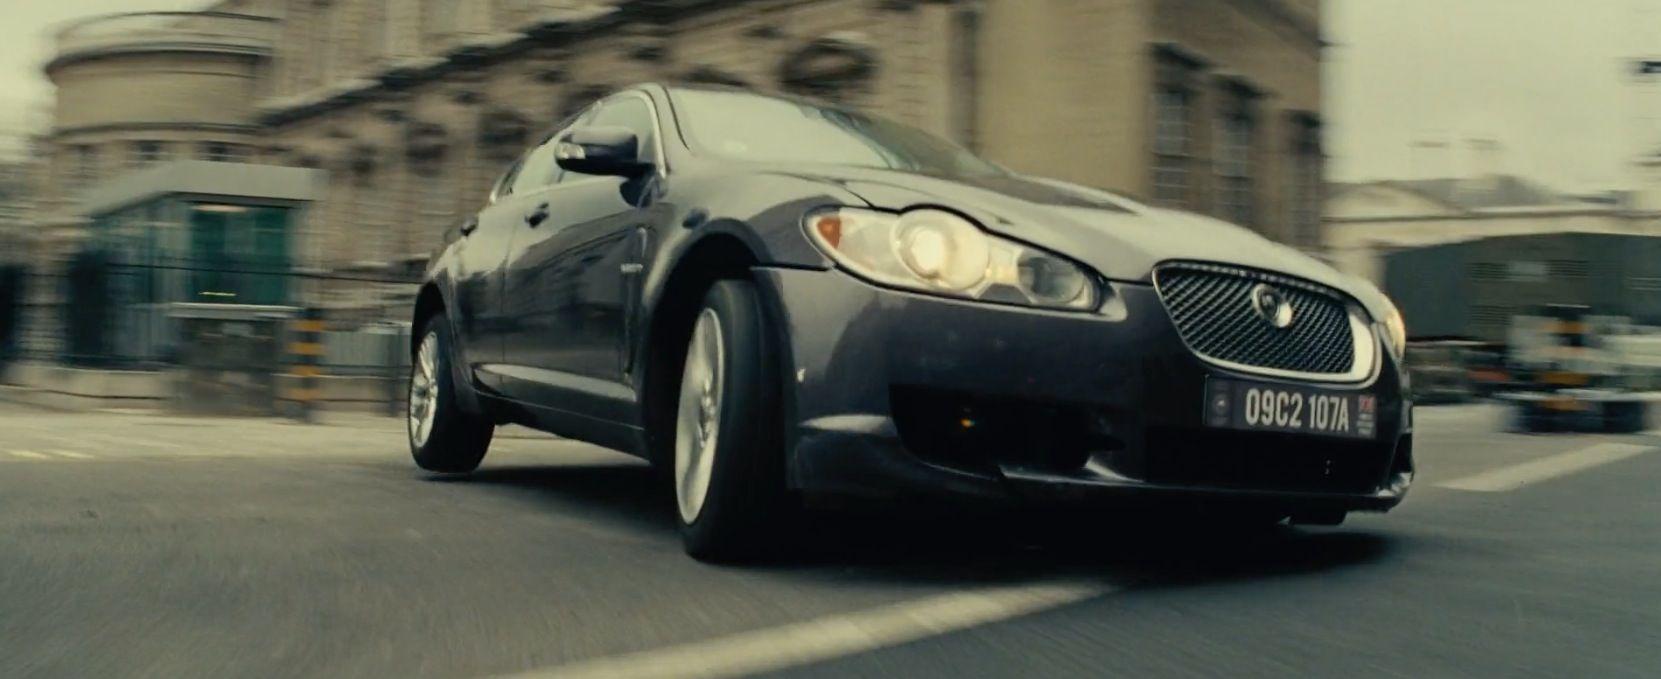 Jaguar XF [X250] (2008) driven by Emily Blunt in EDGE OF TOMORROW (2014) #jaguar